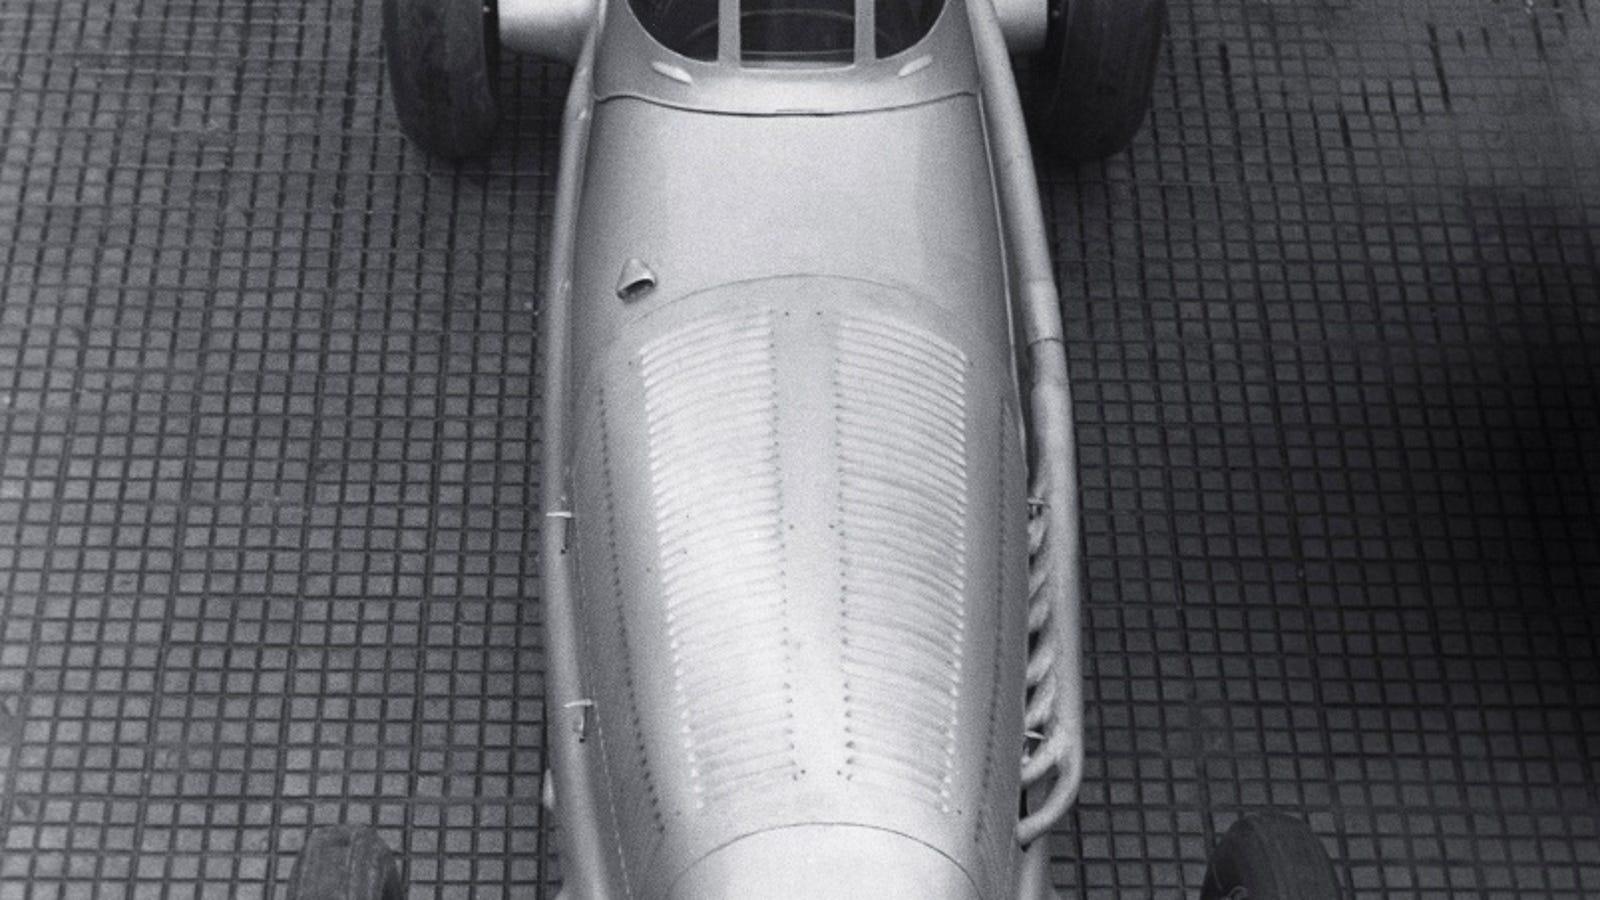 Zoltan Glass motor racing photograph, c 1930s. at Science